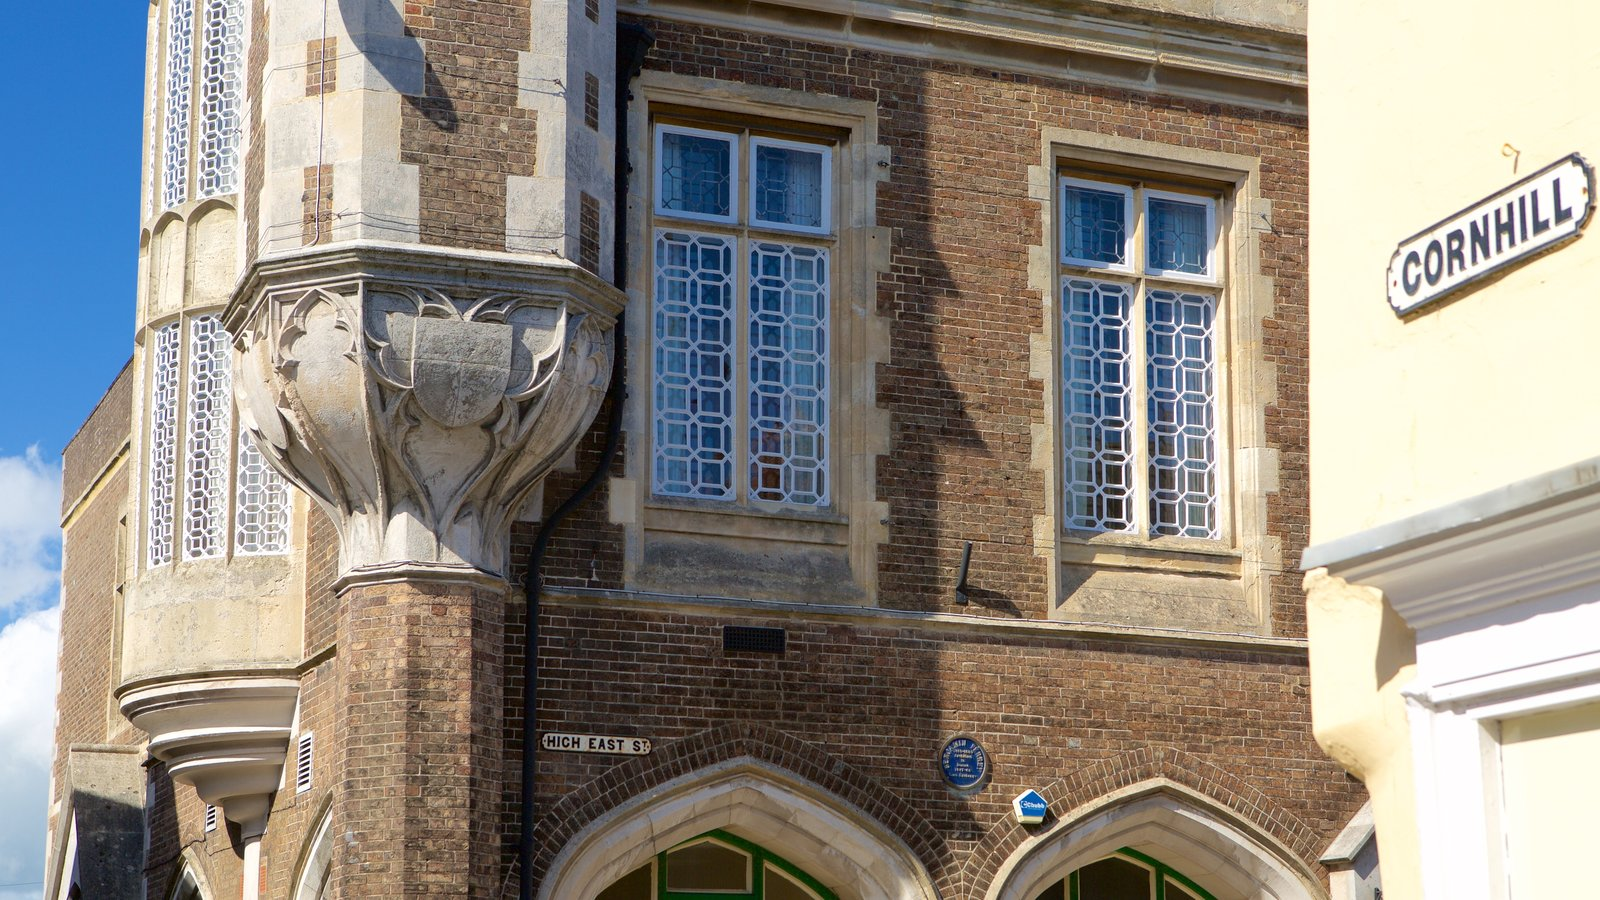 Dorchester caracterizando arquitetura de patrimônio